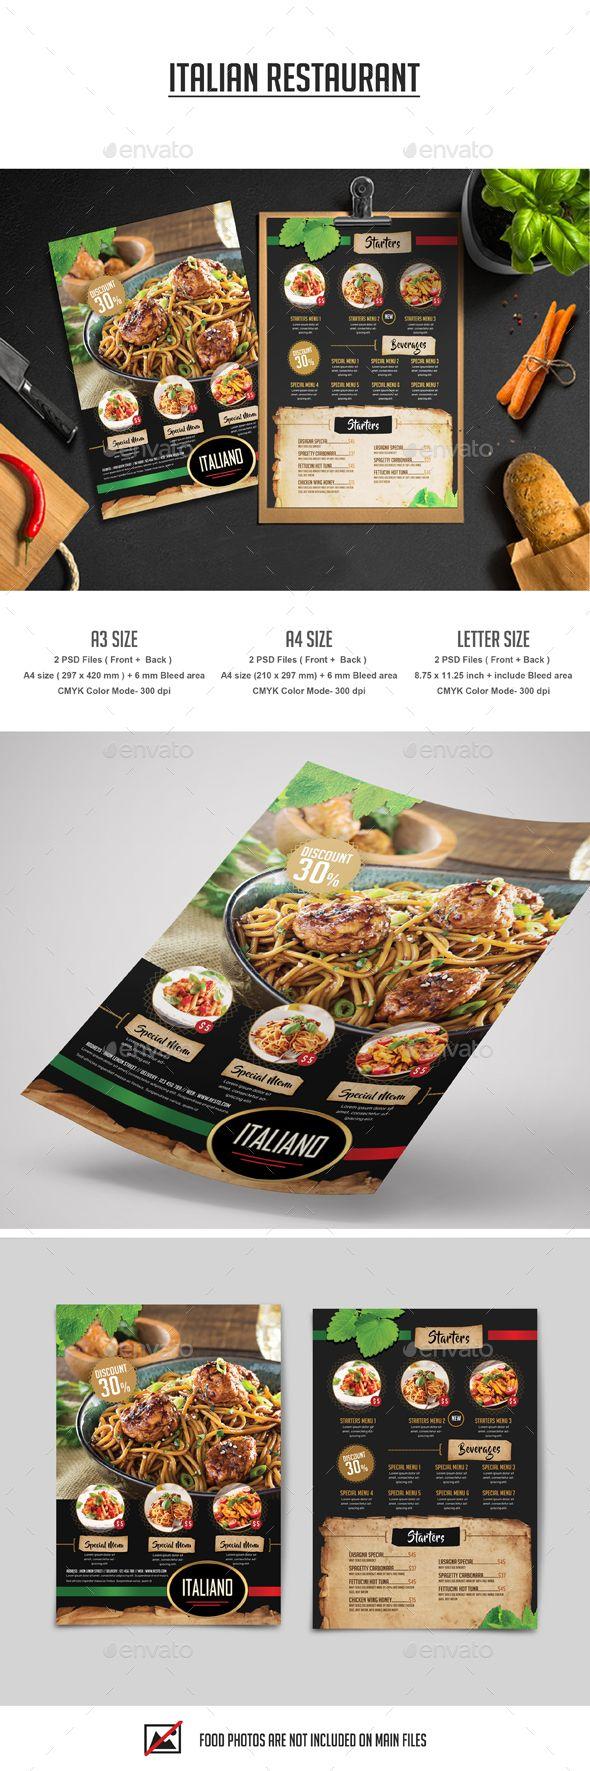 Italian Restaurant Flyer — Photoshop PSD #italian menu #brochure • Download ➝ https://graphicriver.net/item/italian-restaurant-flyer/18945477?ref=pxcr